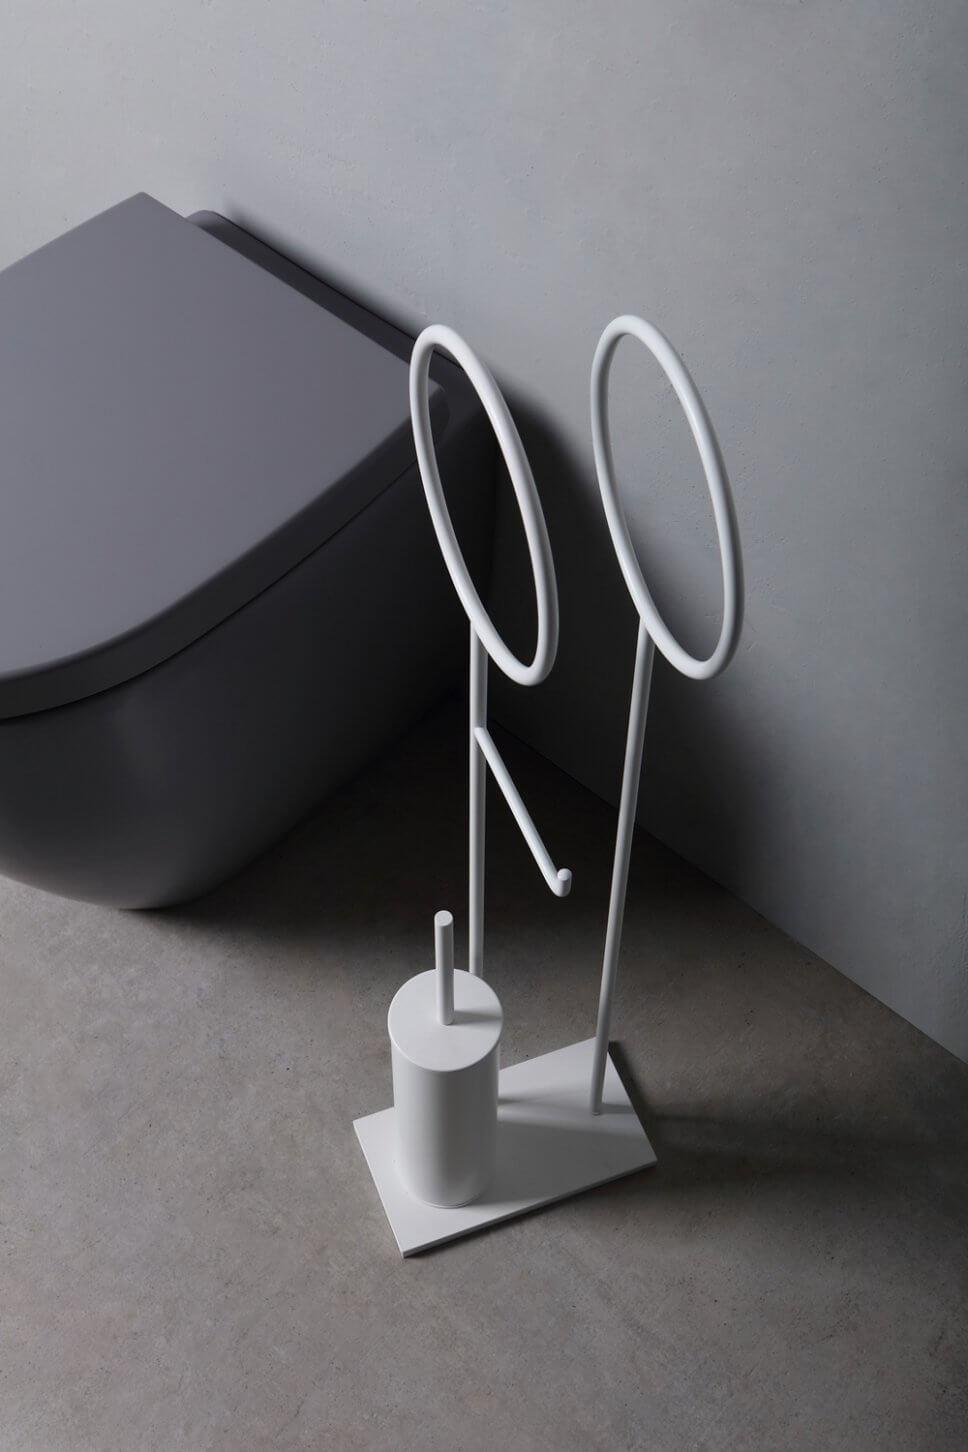 Klobürste in modernem Badezimmer